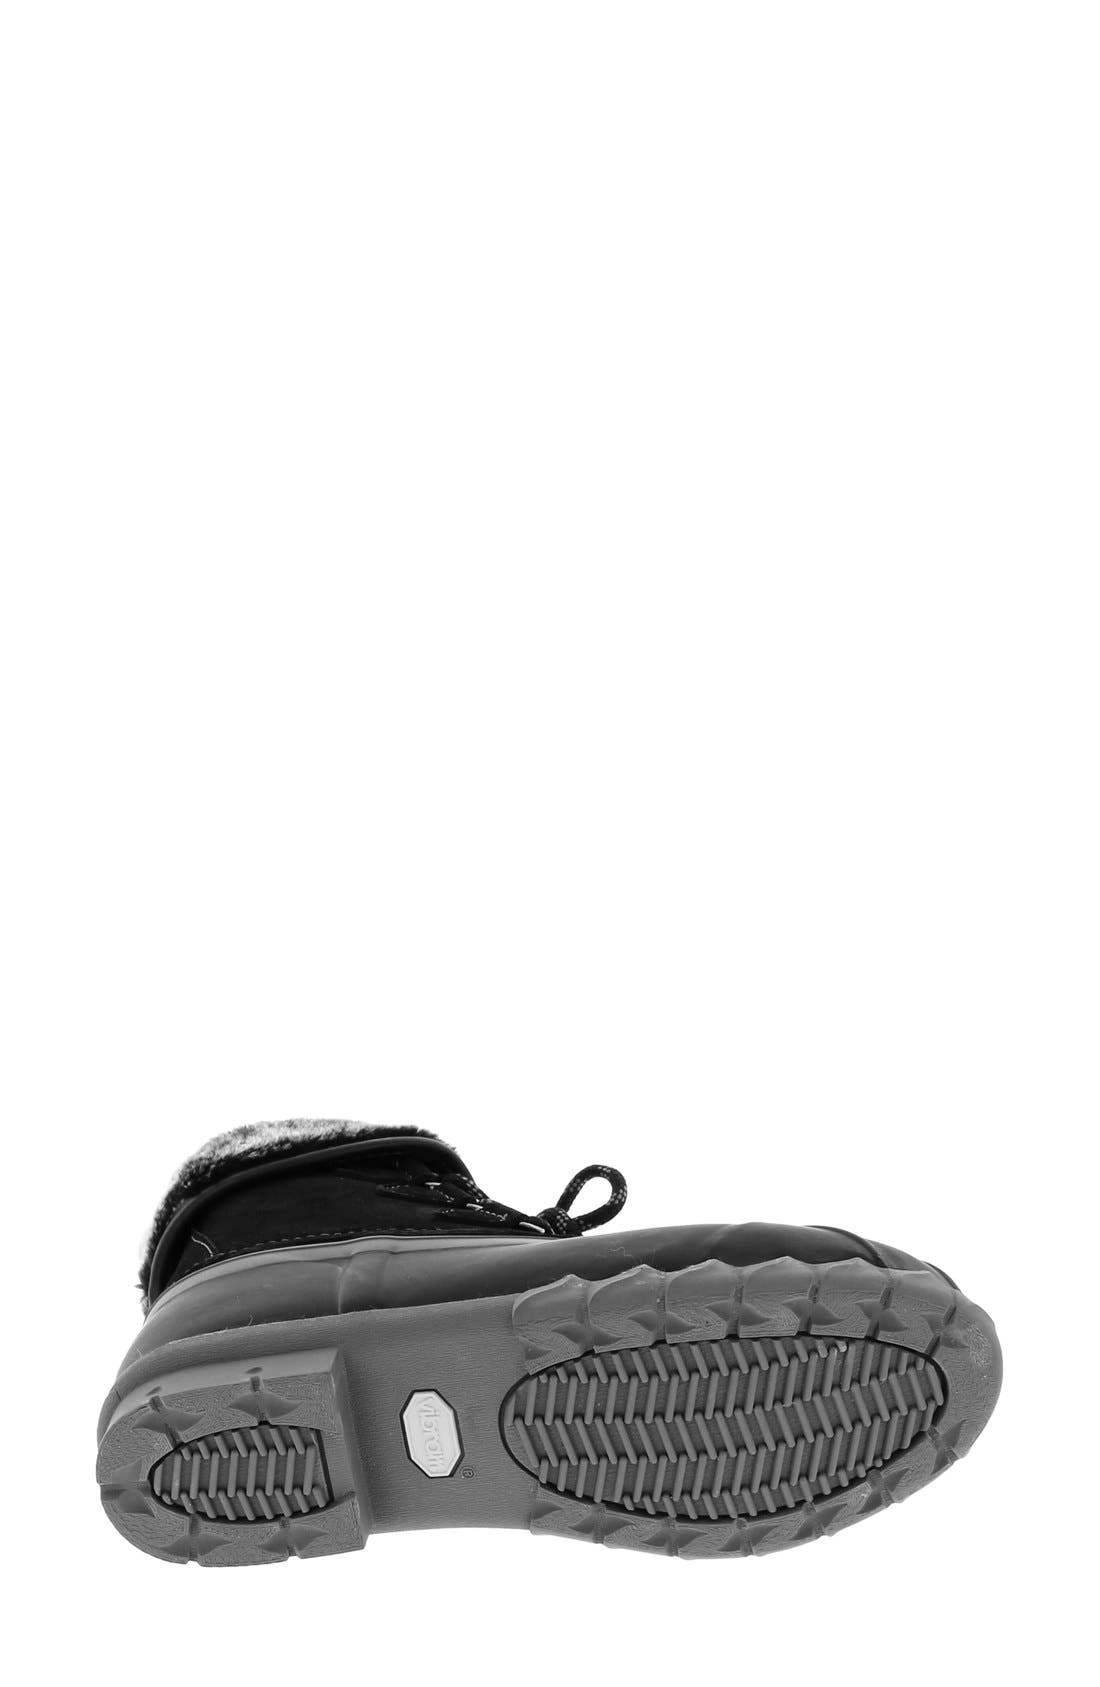 Defrost Faux Fur Lined Duck Boot,                             Alternate thumbnail 4, color,                             Black/ Black